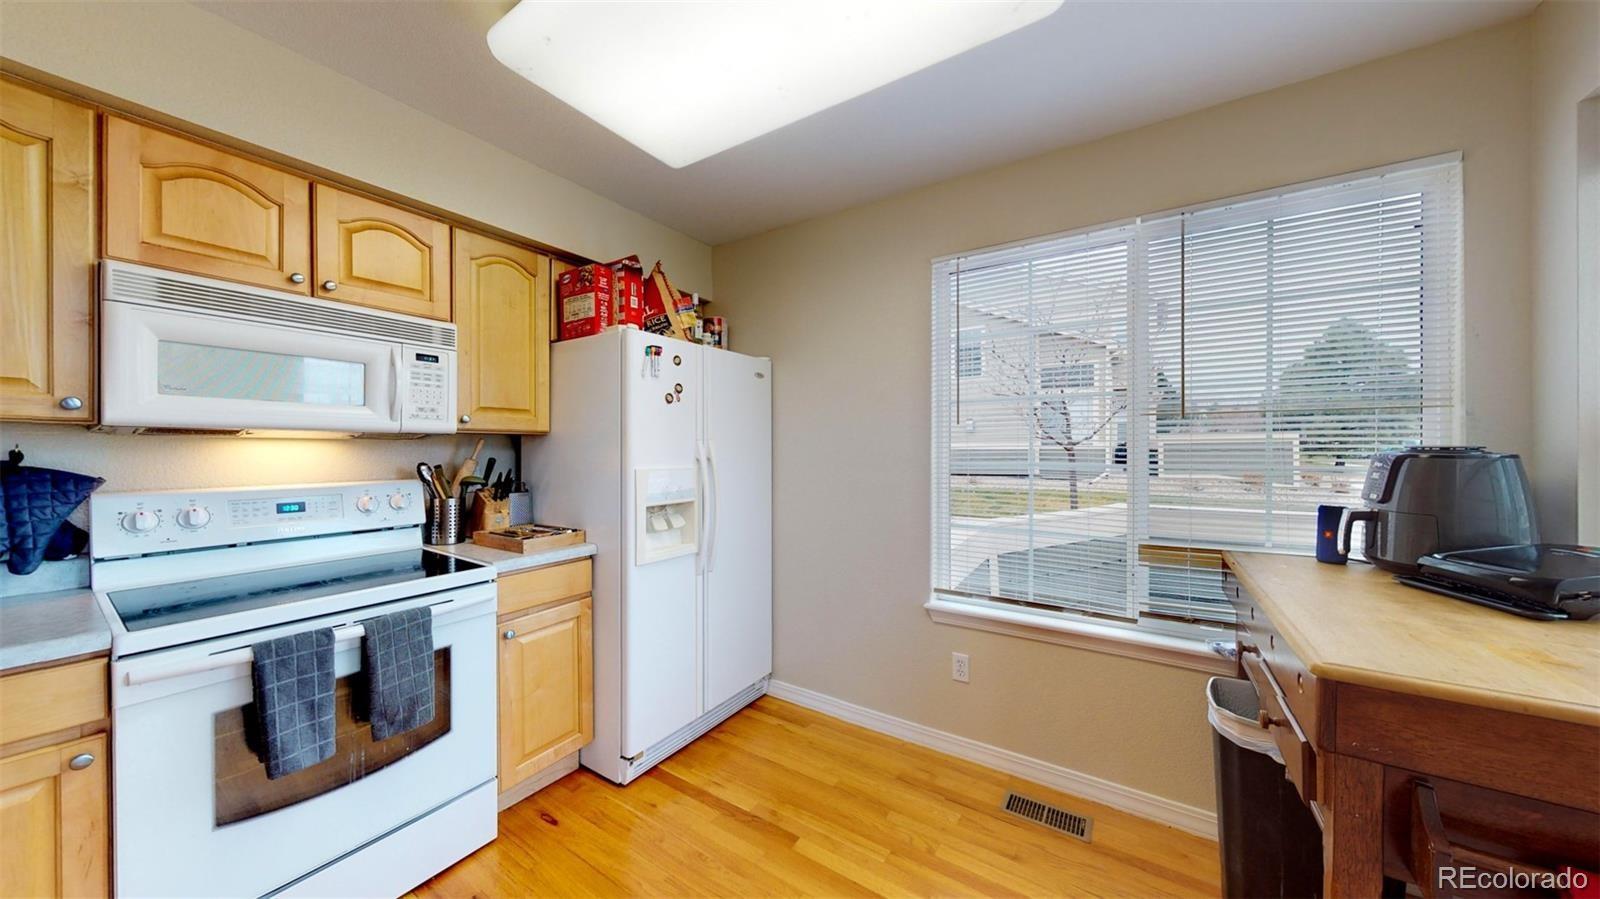 MLS# 7794532 - 10 - 6808 Antigua Drive #31, Fort Collins, CO 80525